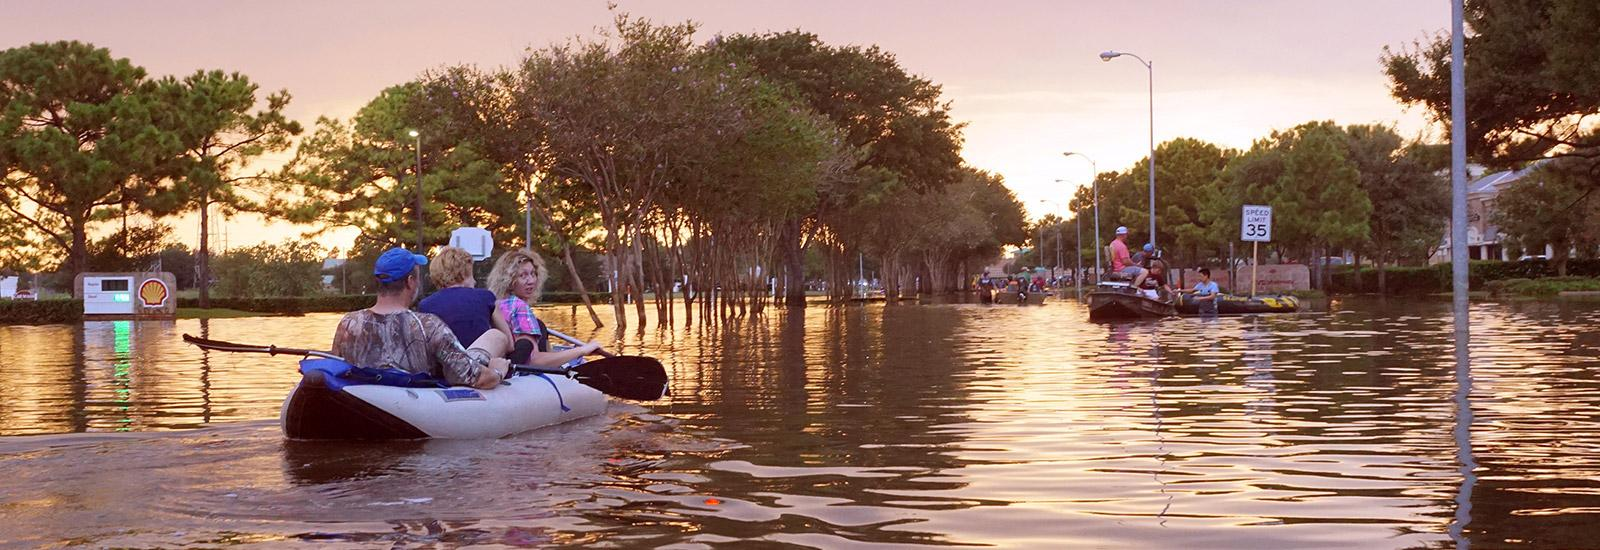 Houston Under Water: Untold Stories of Hurricane Harvey